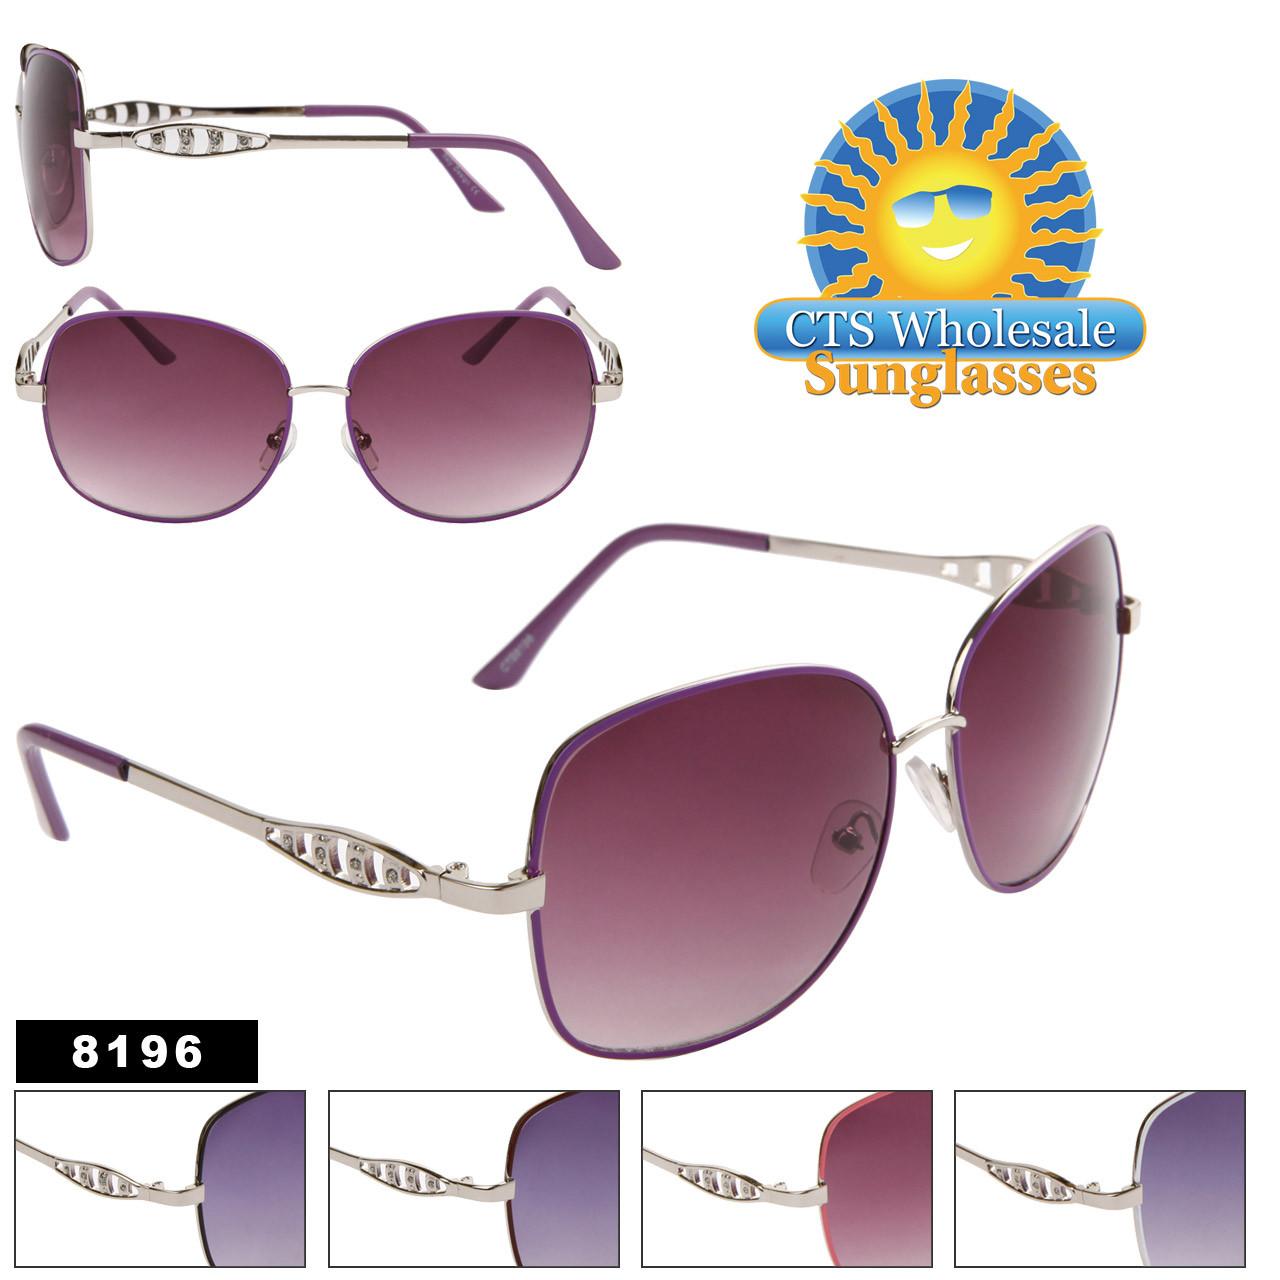 Women's Wholesale Designer Sunglasses - 8196